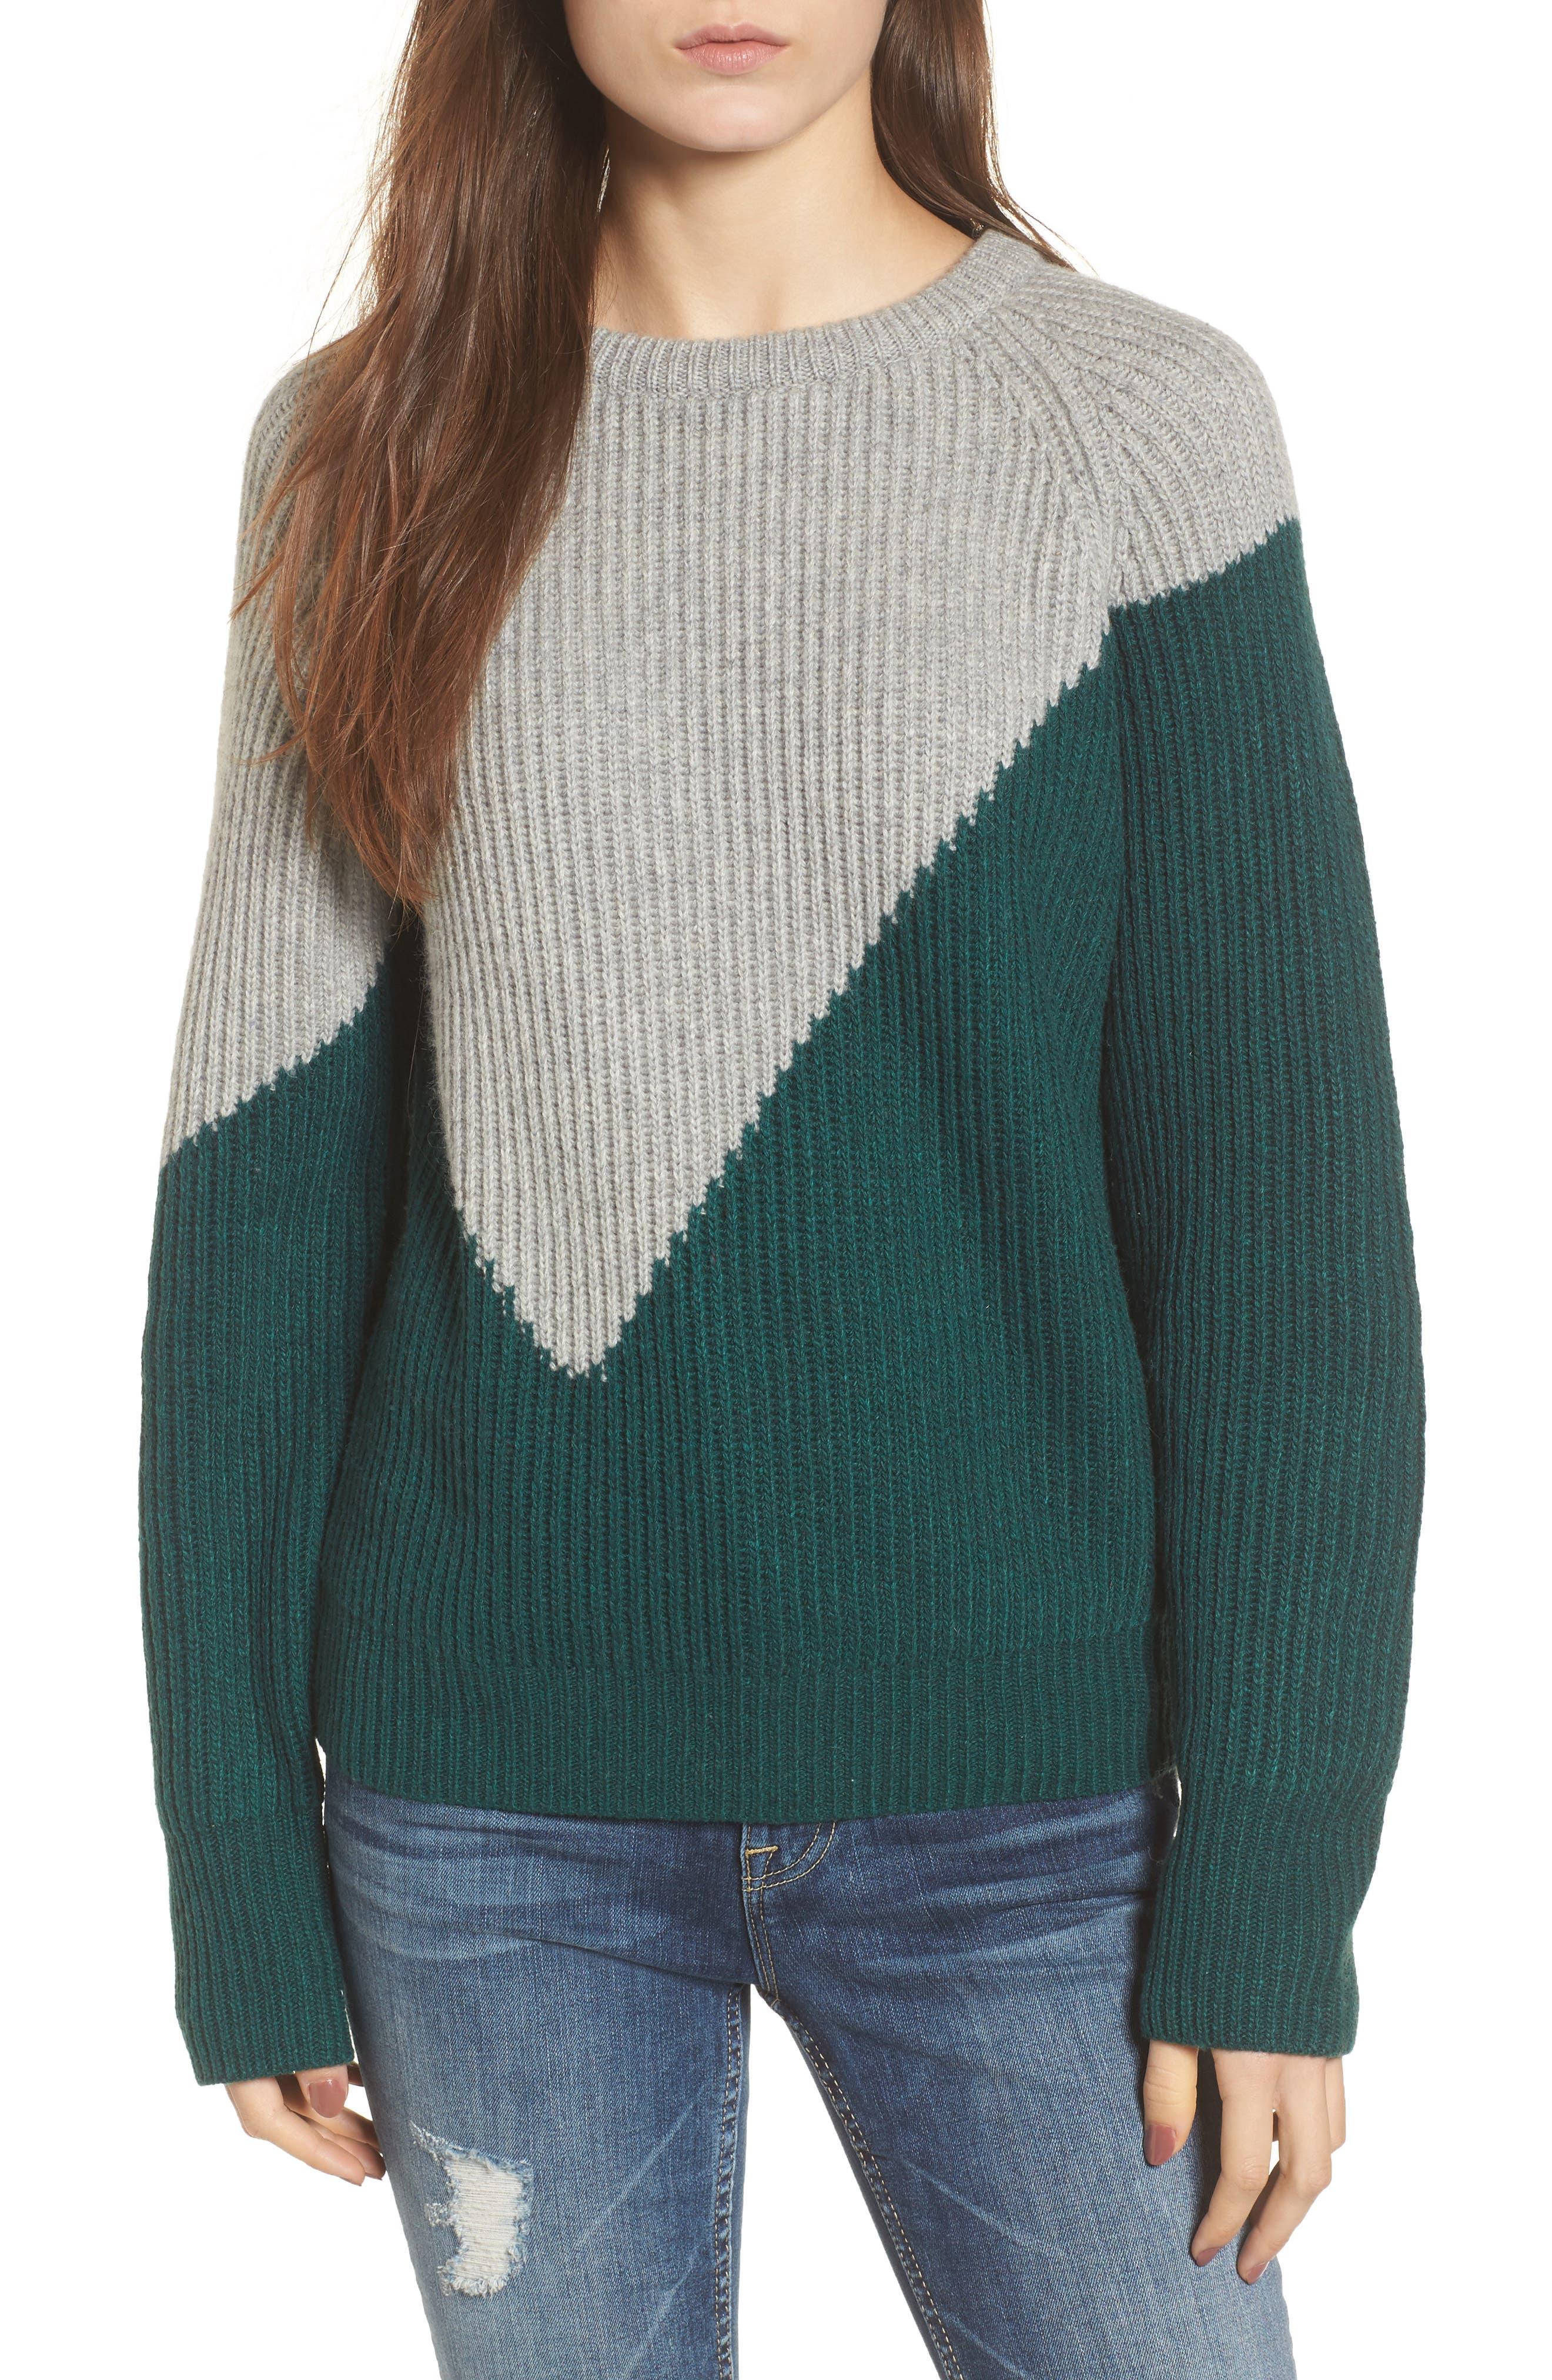 Alternate Image 1 Selected - EVIDNT Unbalanced Pattern Wool Blend Sweater